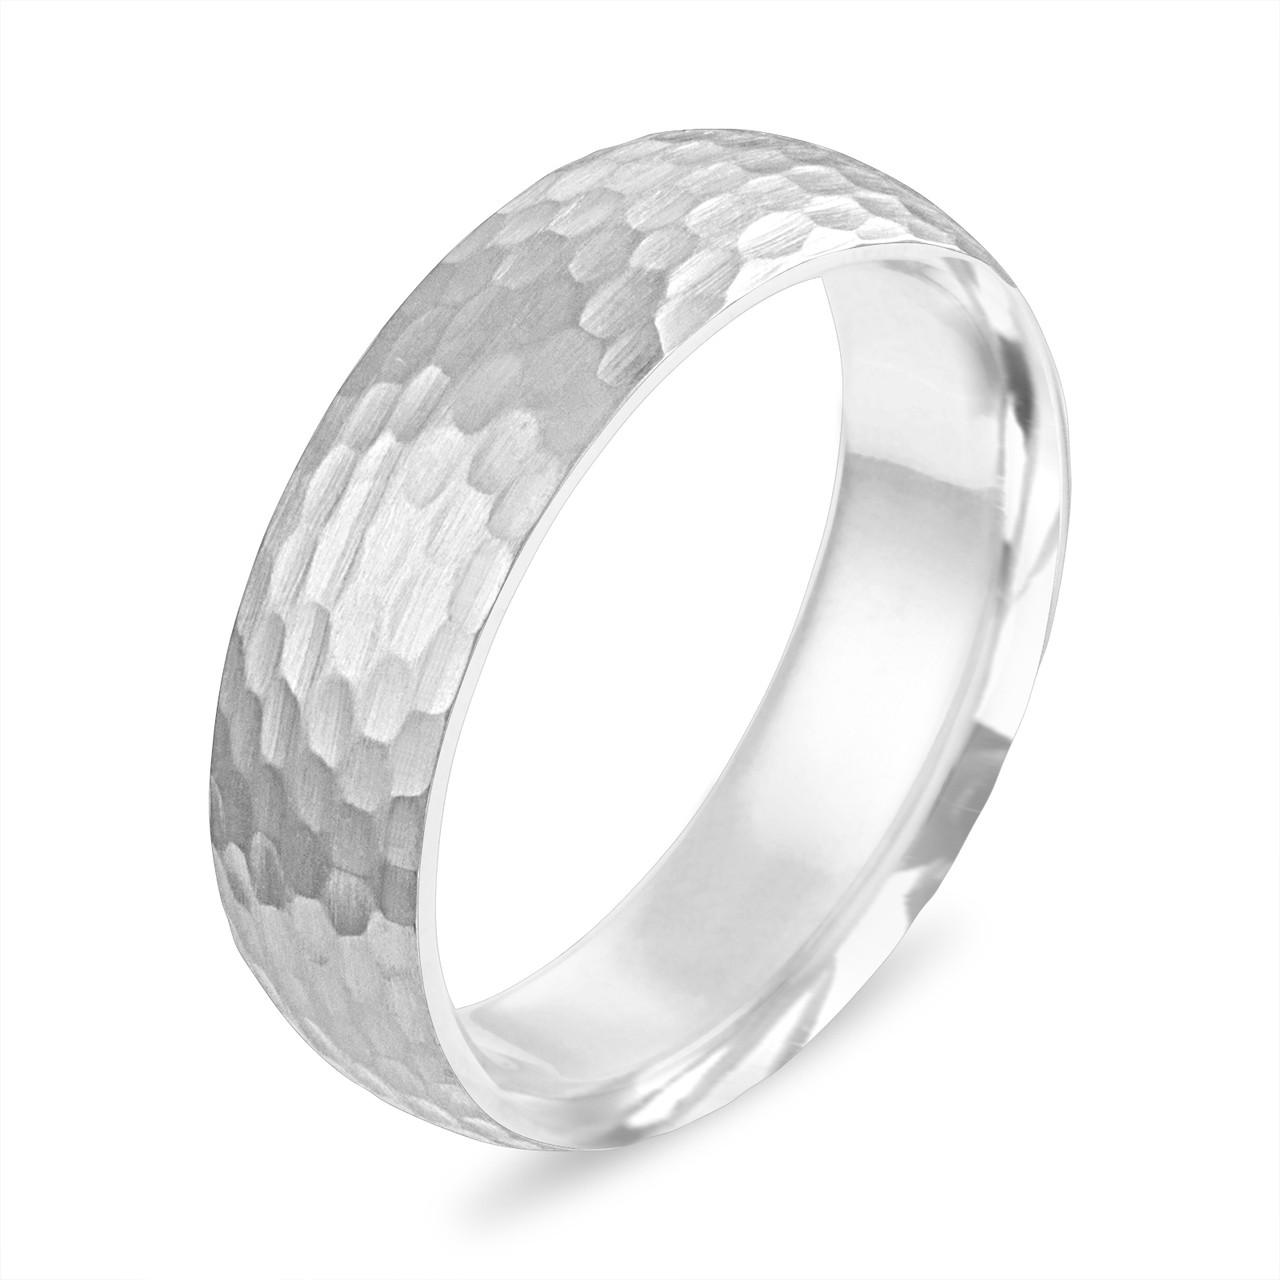 Hammered Finish Wedding Band Hammered Mens Wedding Ring White Gold